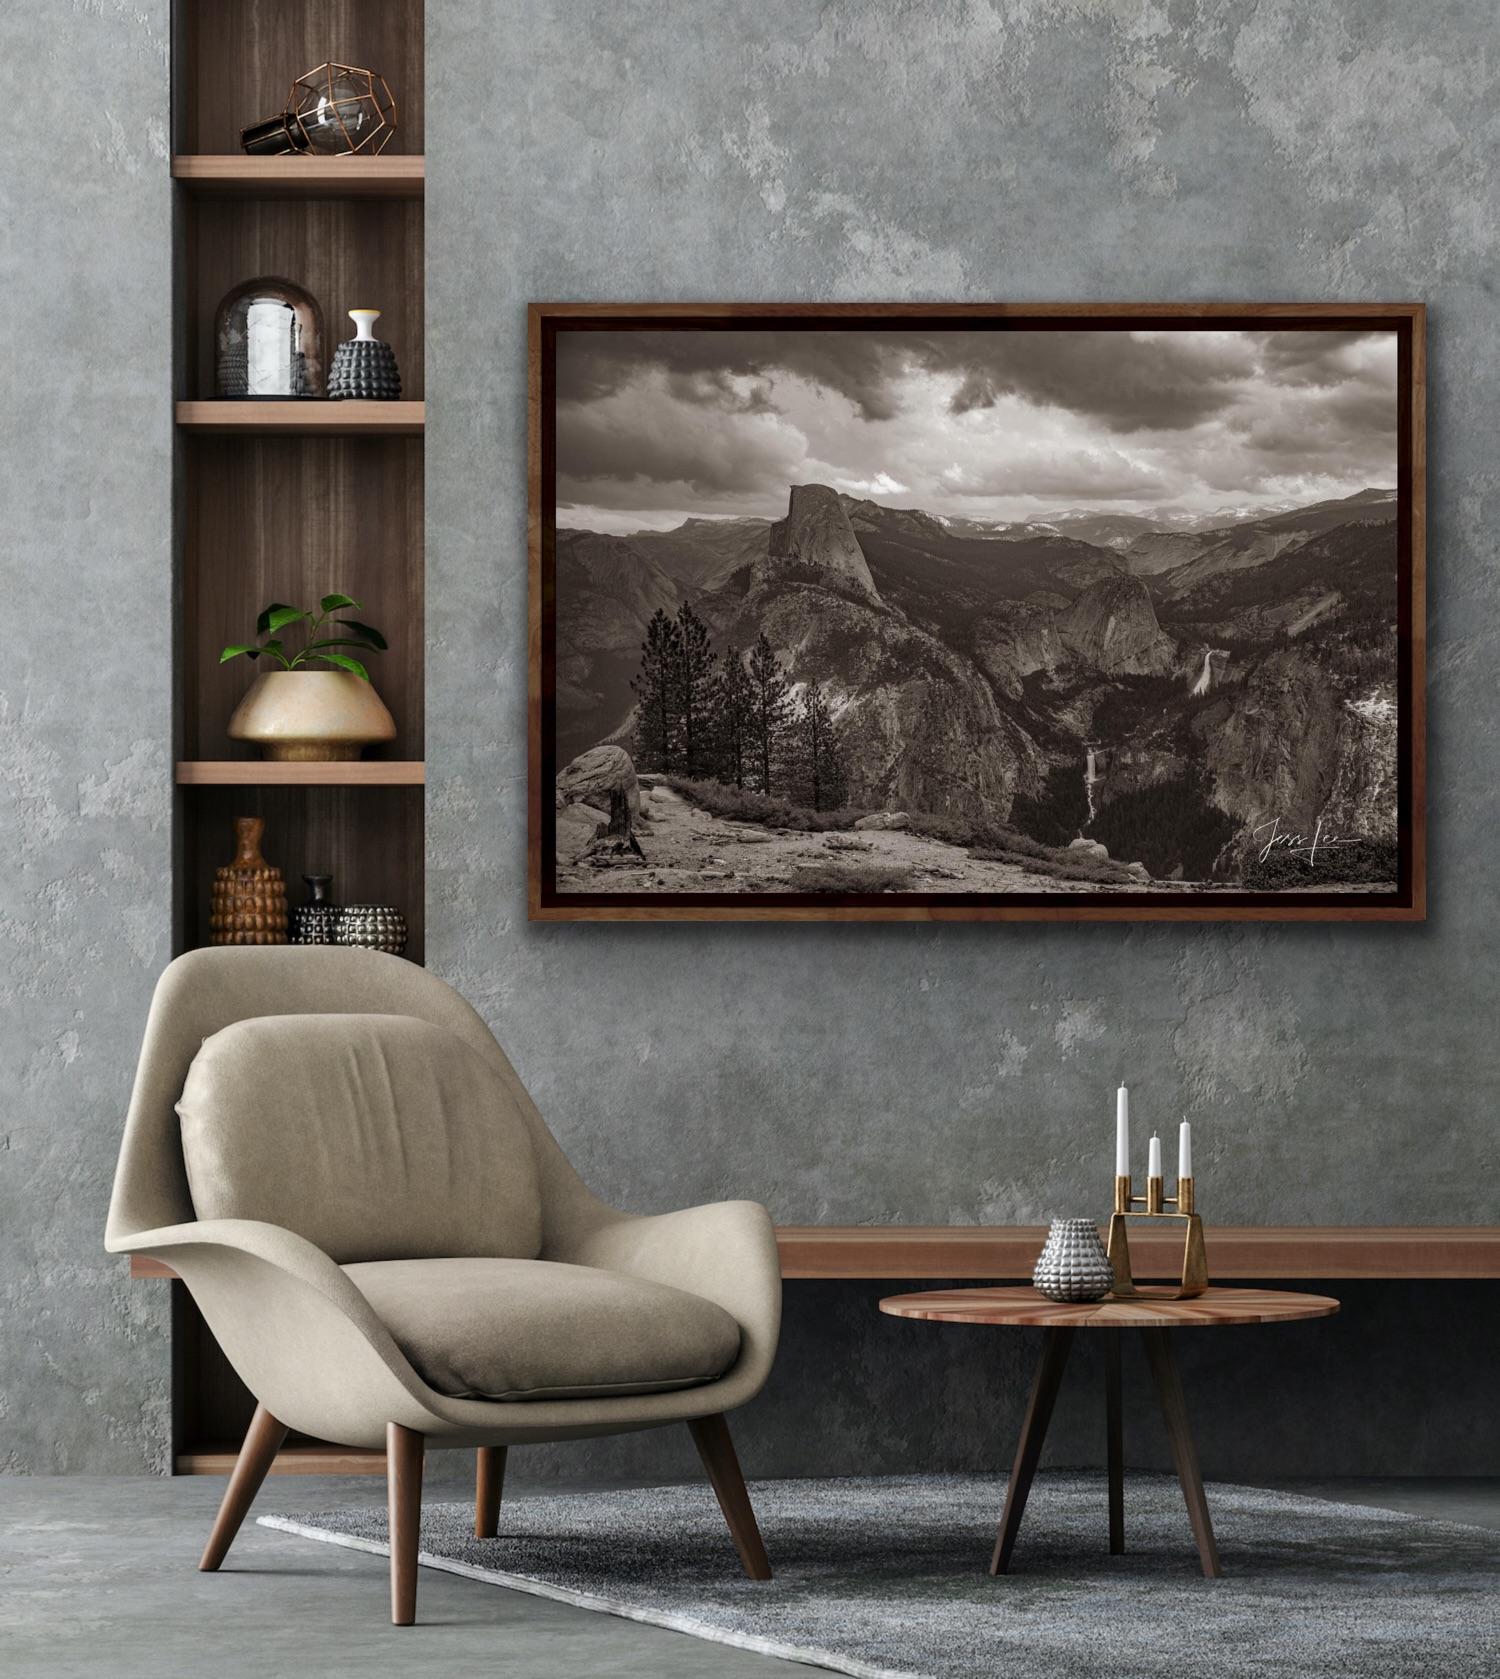 Yosemite Black and White Large Format Ansel Adams Style Prints